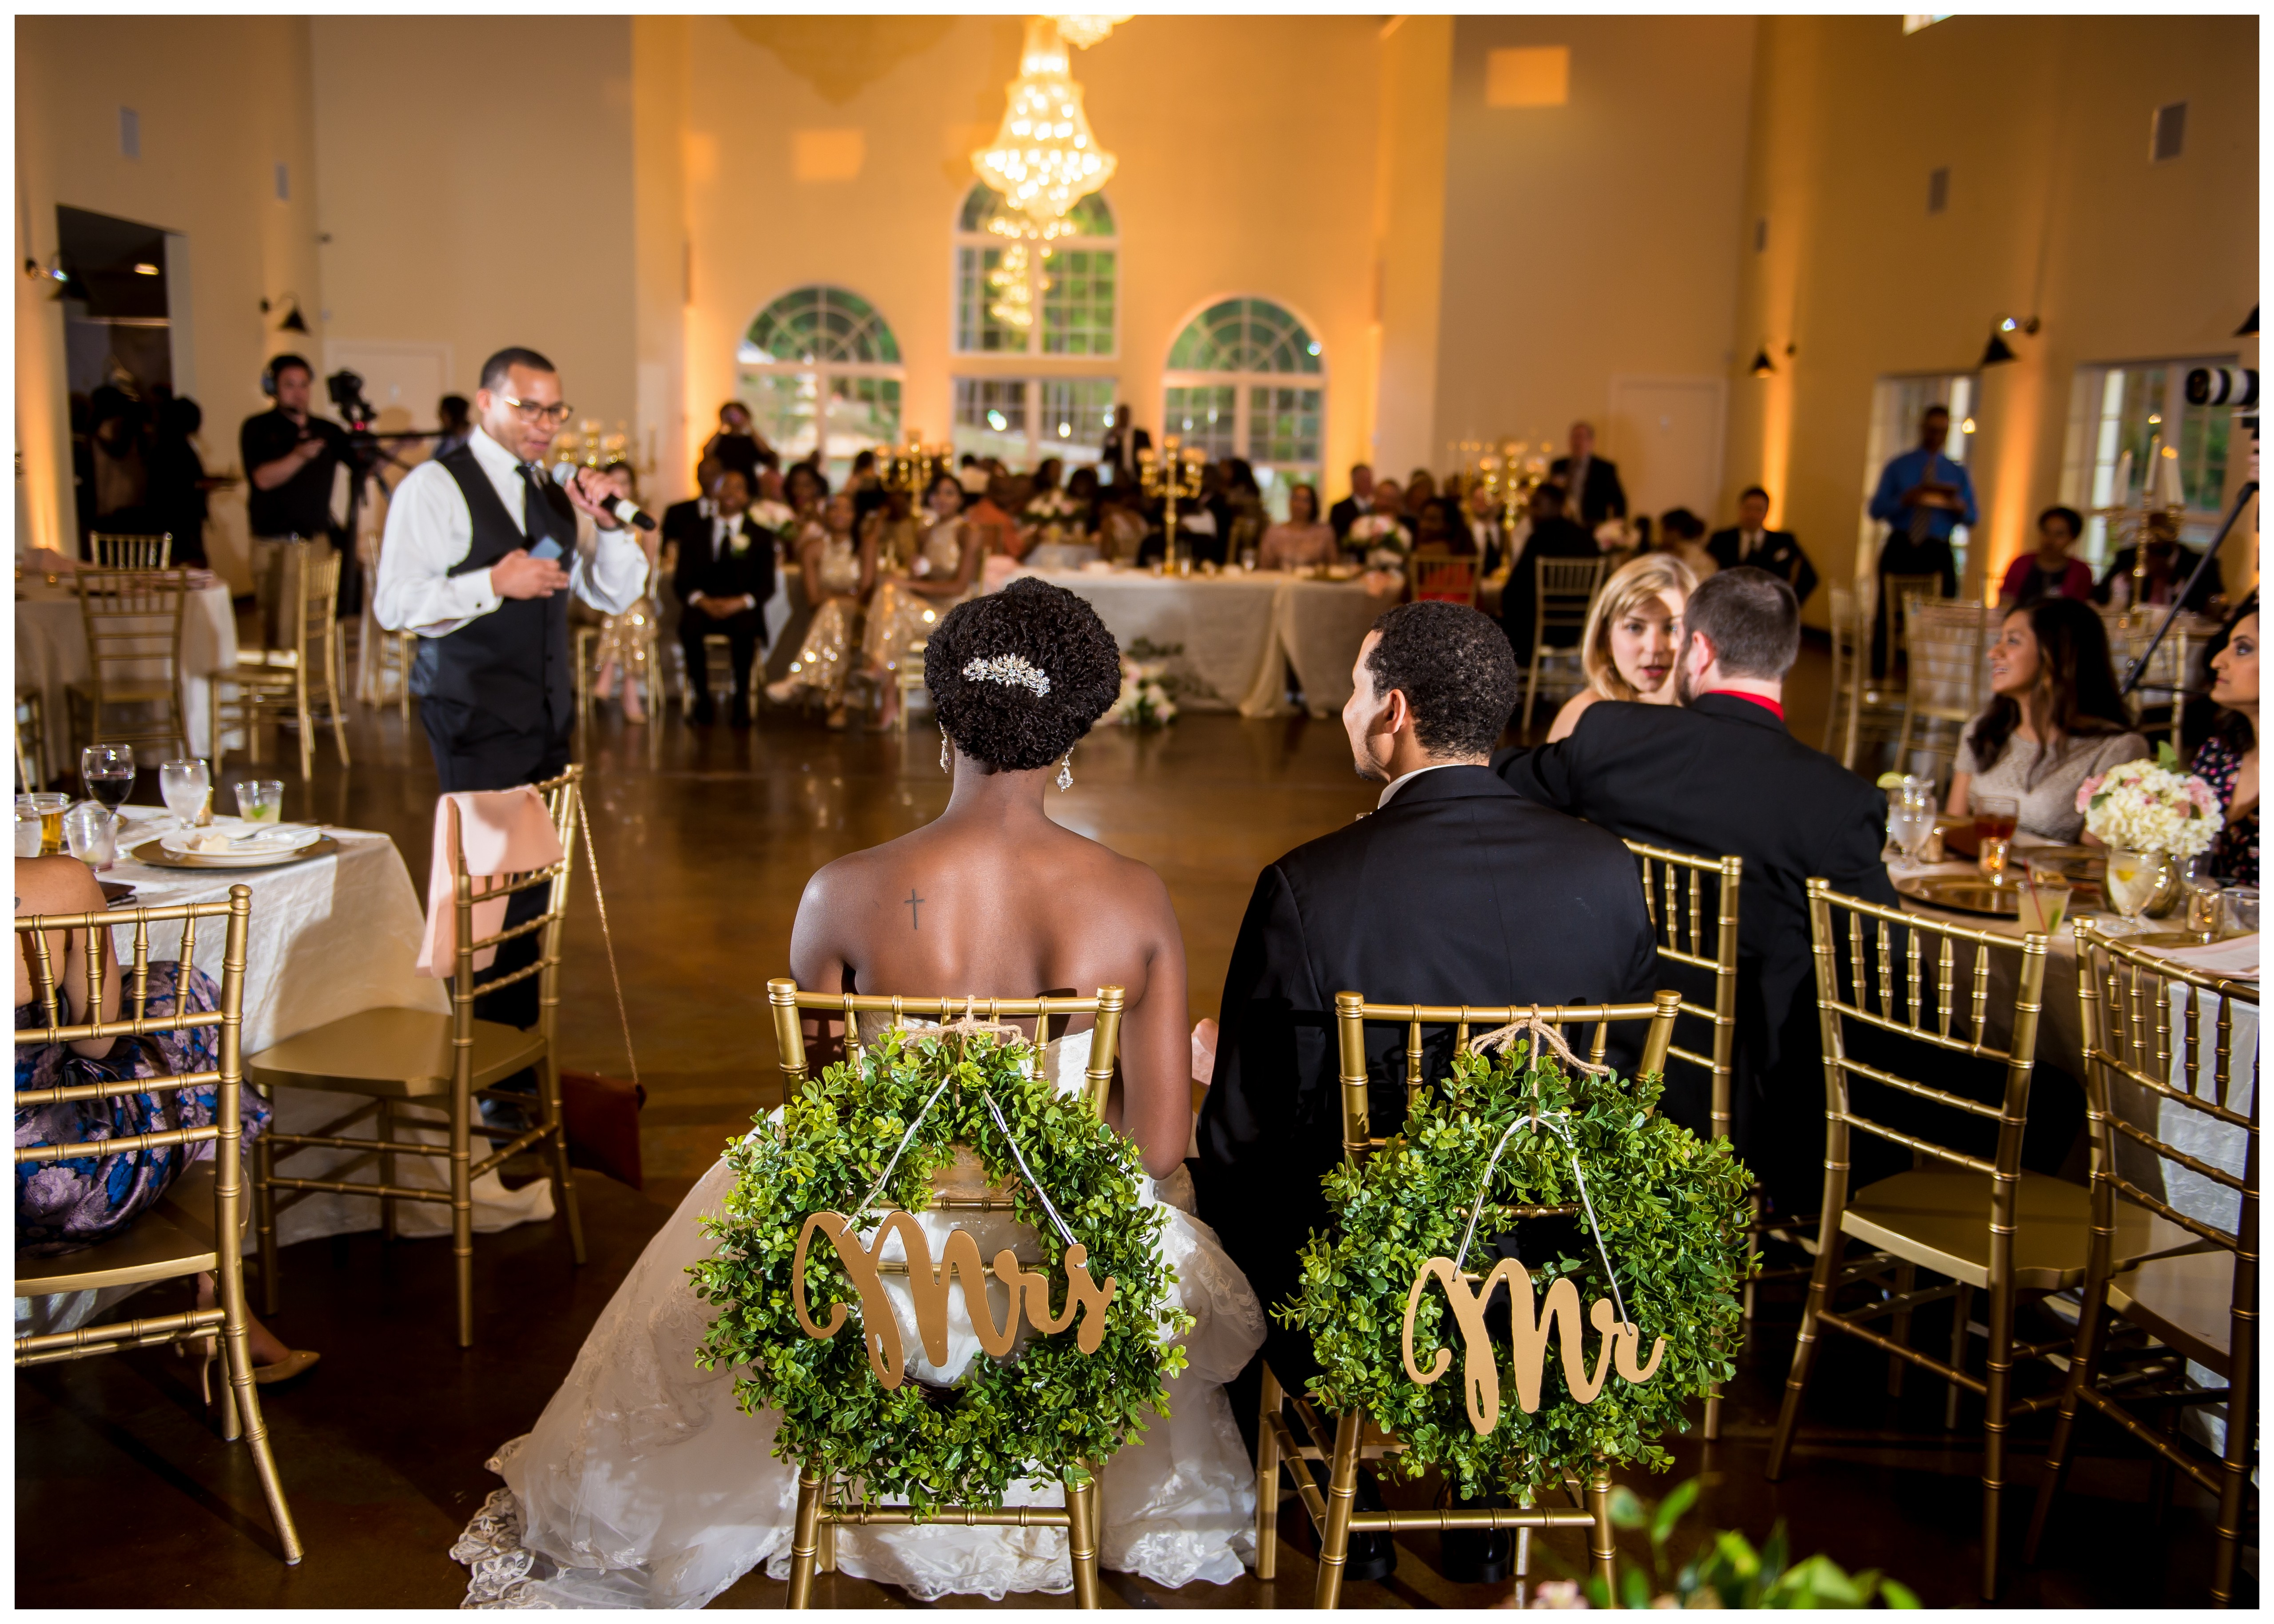 LIVE_FINAL_WEDDING_JAREN_ELISSABETH21